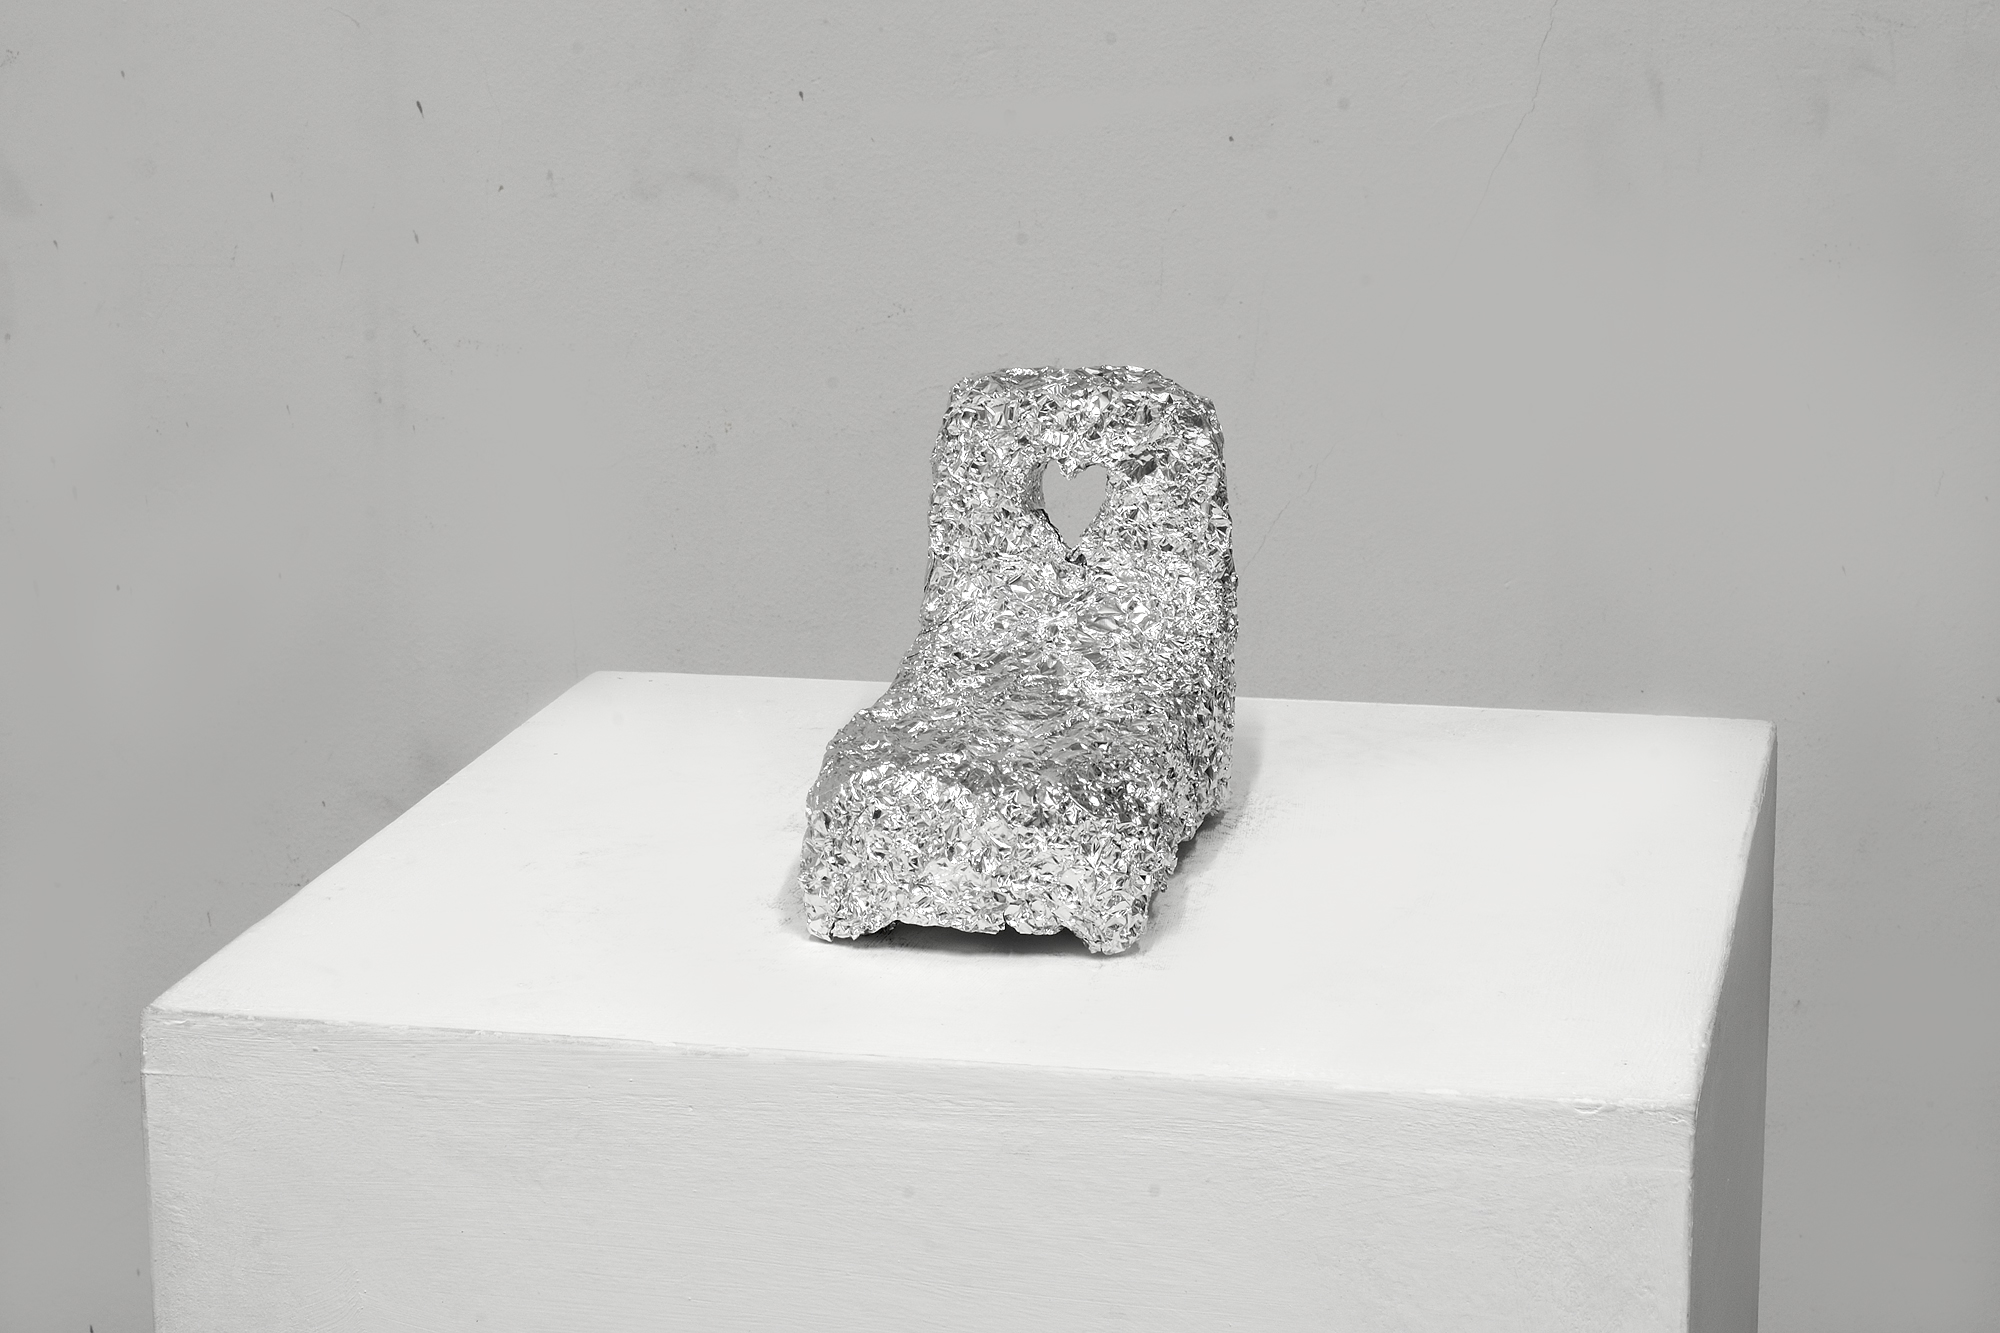 Fernando J. Ribeiro_aluminum sculpture_bed_2015